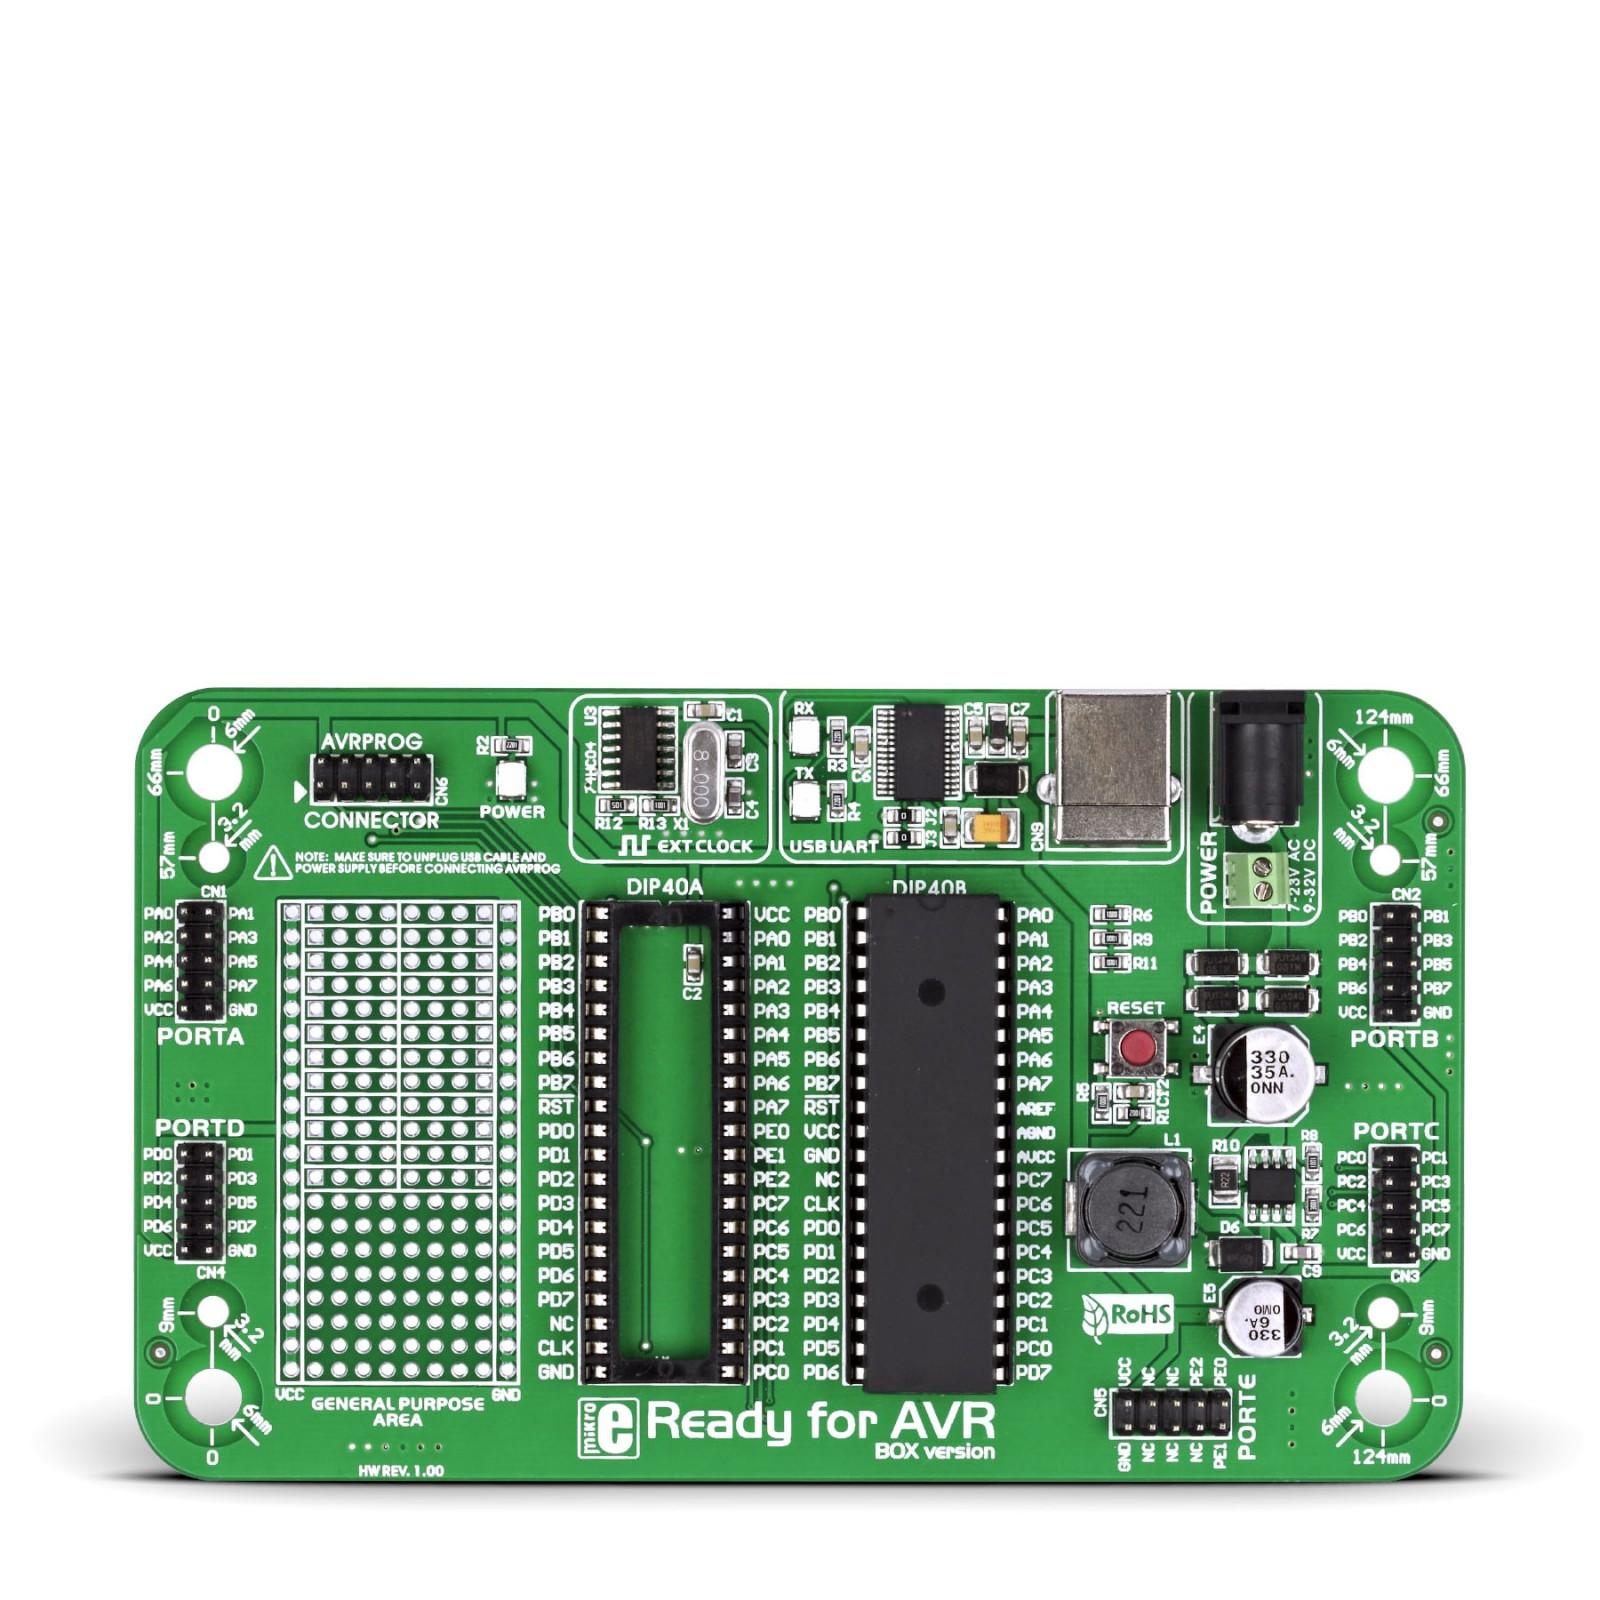 Ready For Avr 40 Pin Development Board With Atmega16 Lcd Interfacing Electronic Circuits And Diagram Mgctlbxnmzp Mgctlbxv5112 Mgctlbxlc Mgctlbxpprestashop